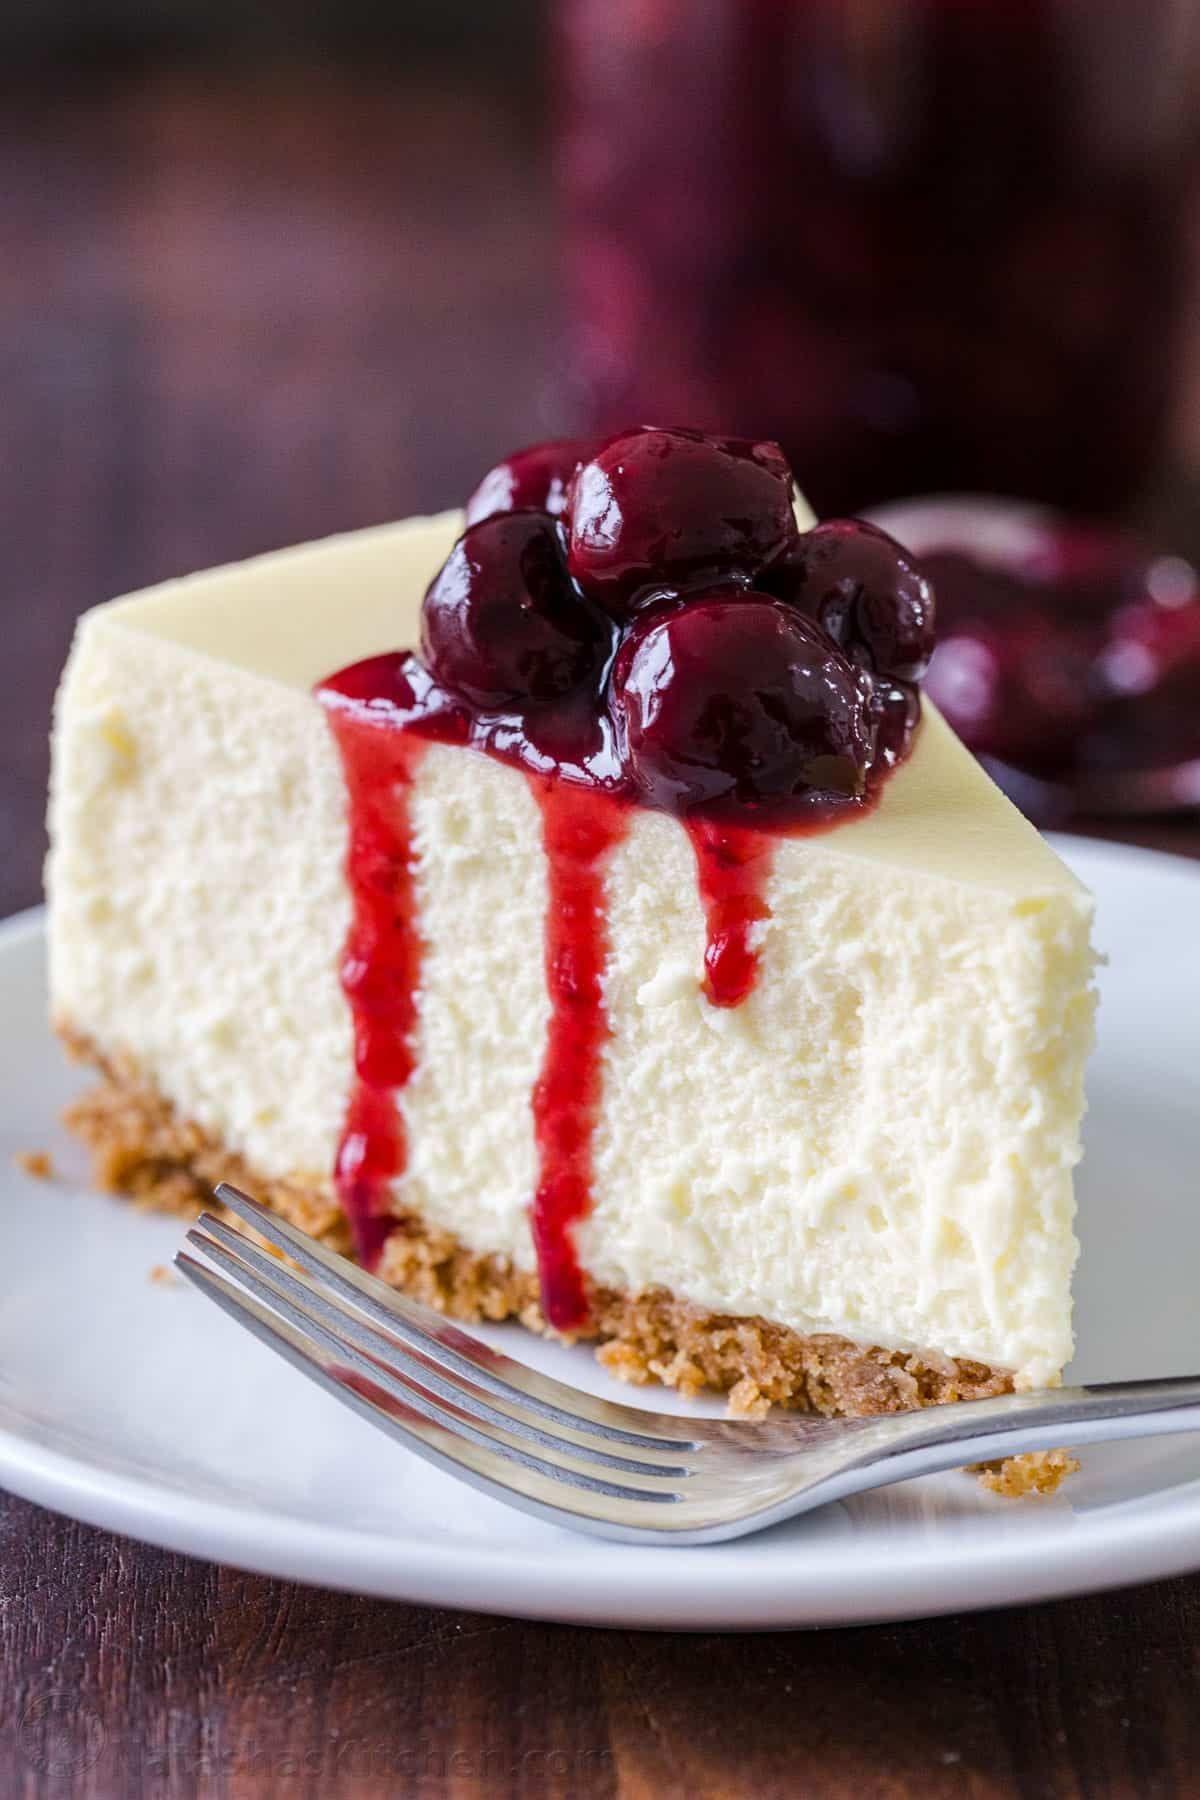 طريقة عمل التشيز كيك In 2021 Perfect Cheesecake Recipe Cheesecake Recipes Thanksgiving Food Desserts